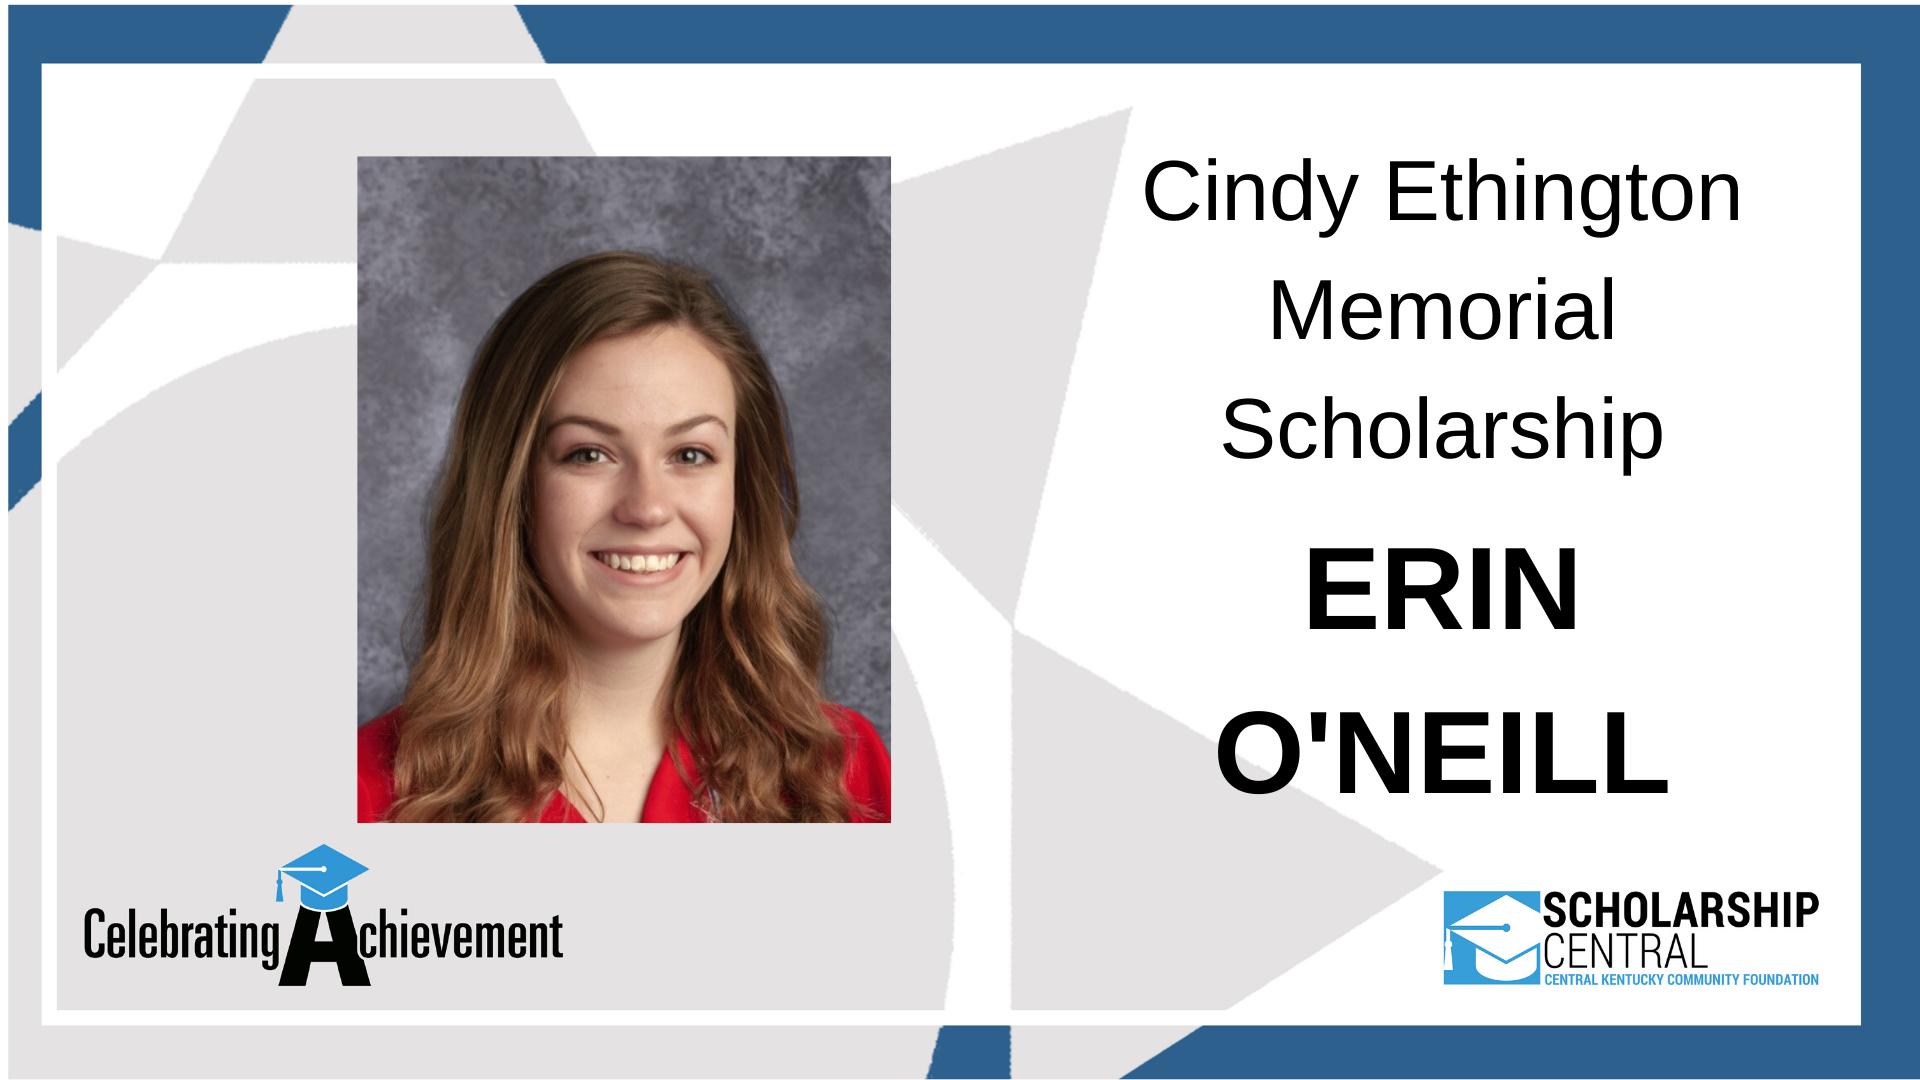 Cindy Ethington Scholarship